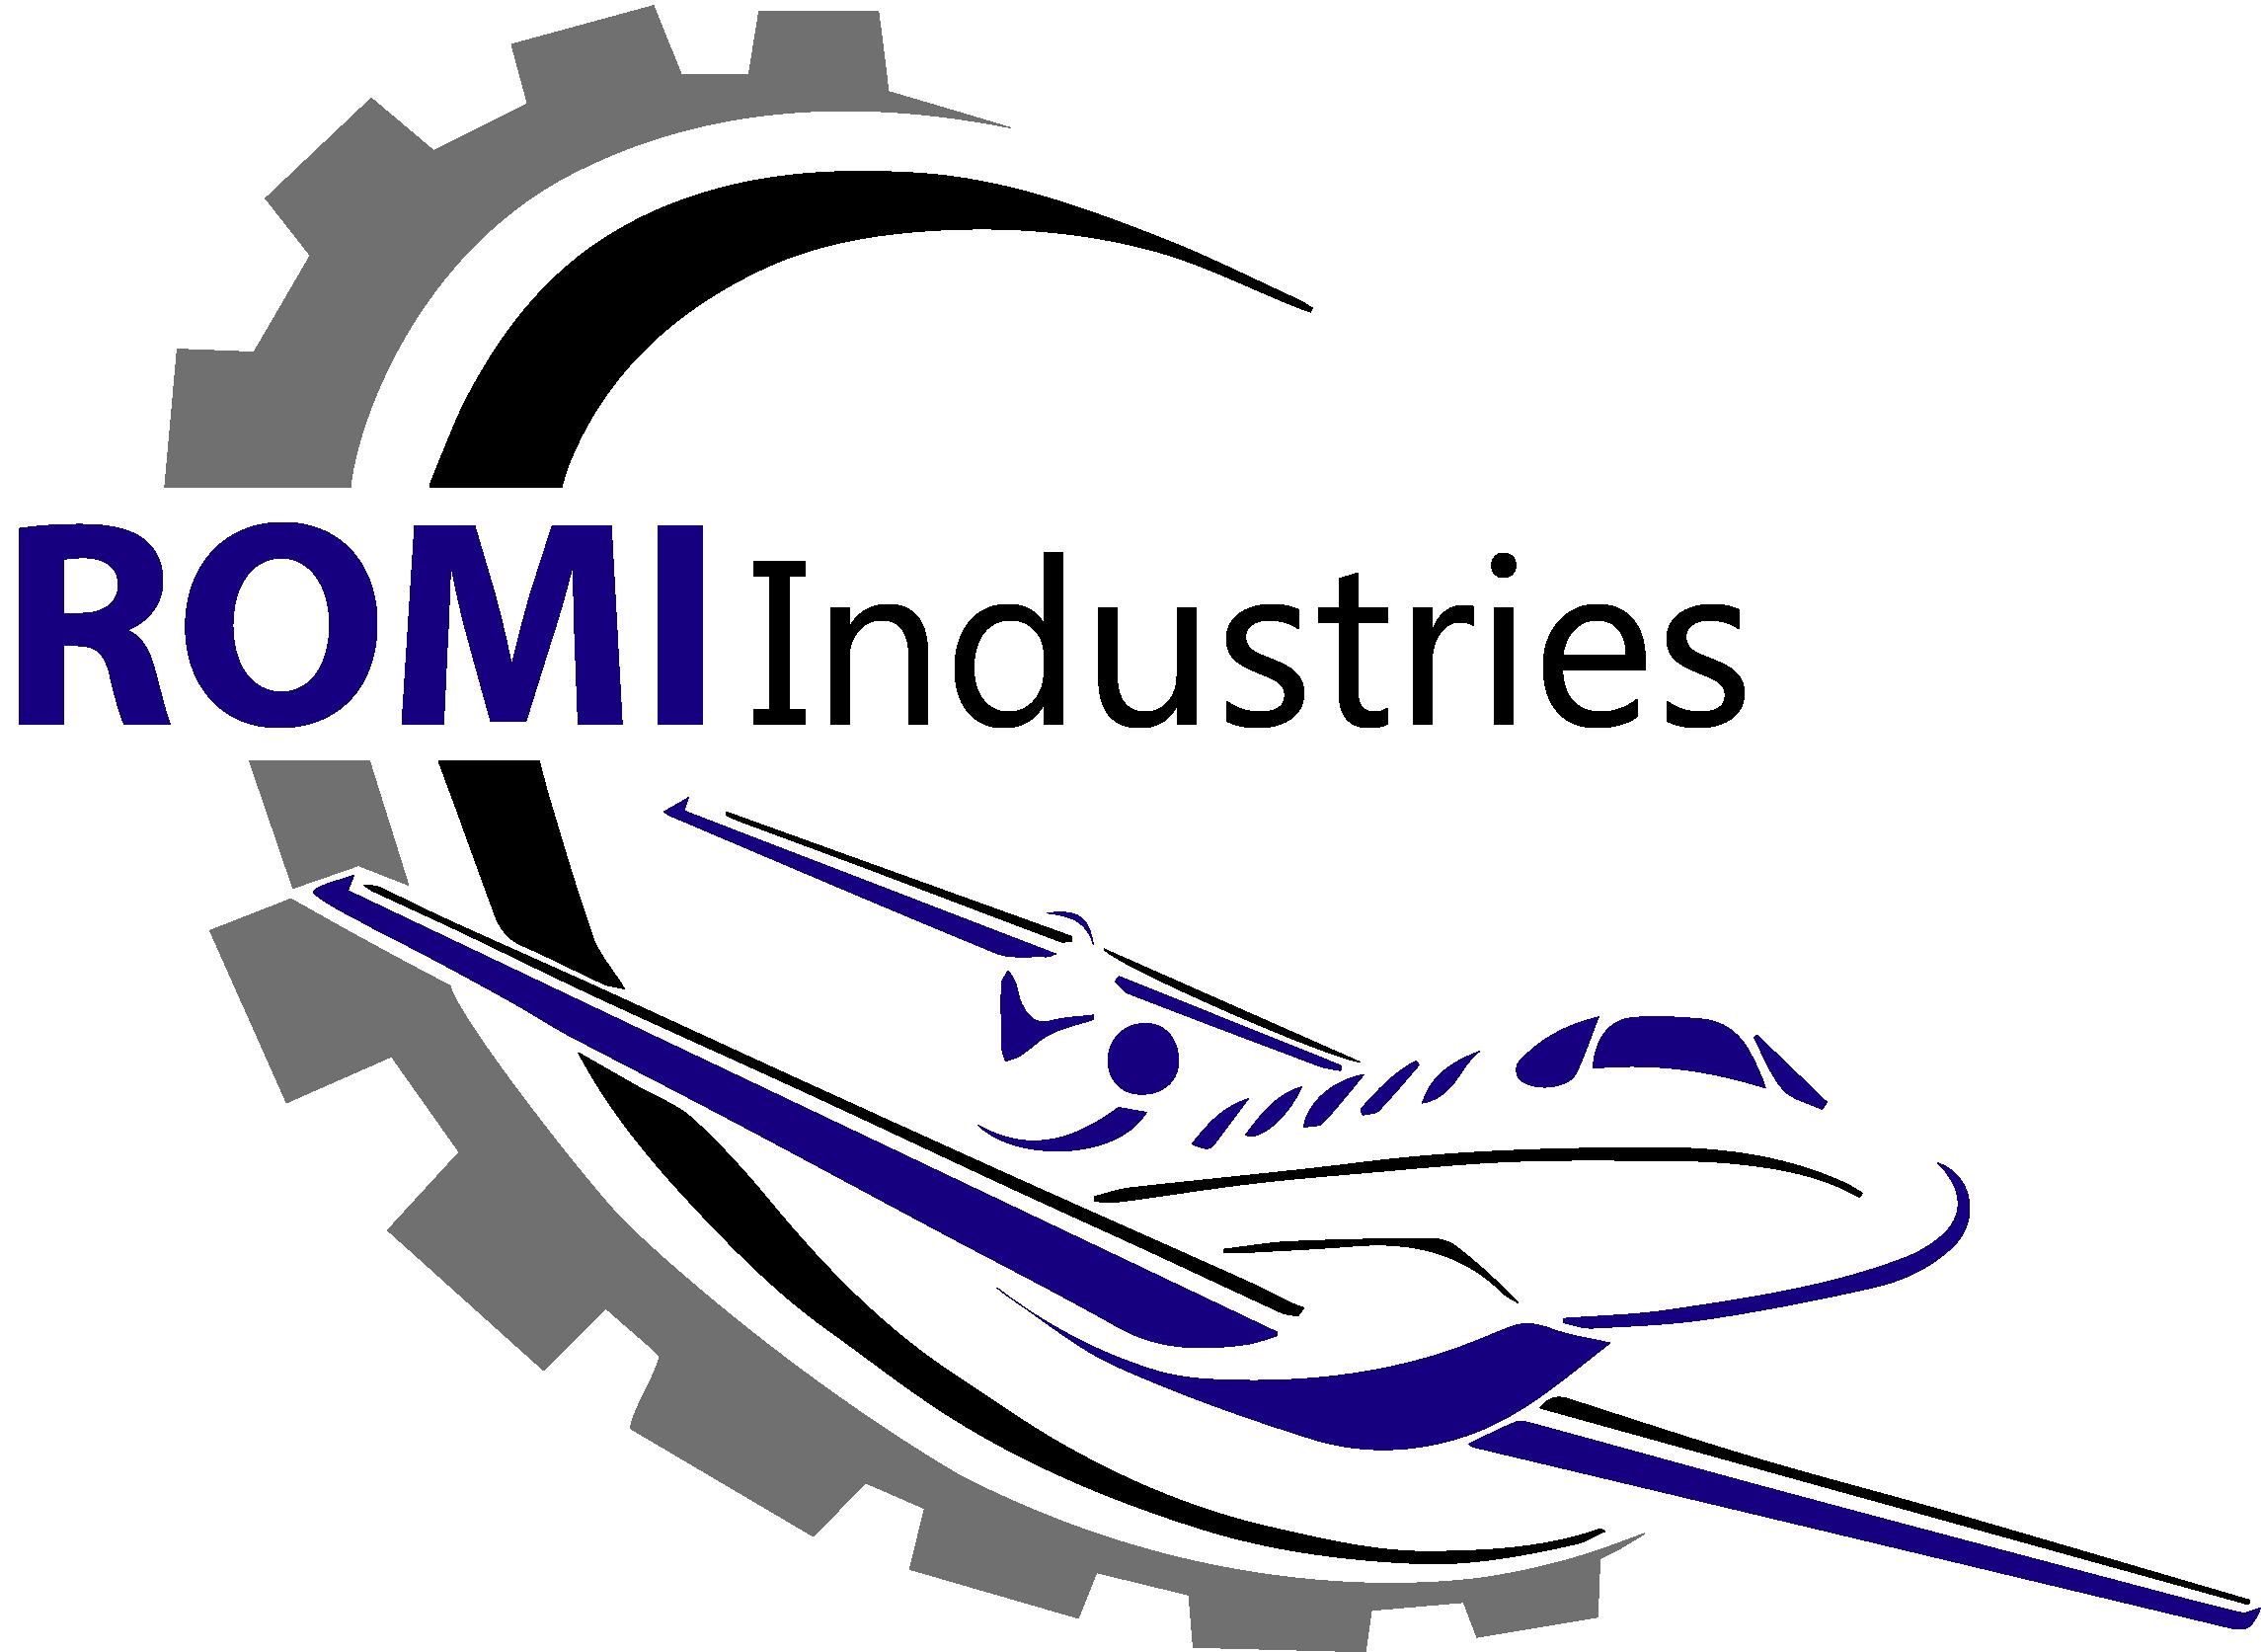 Romi Industries